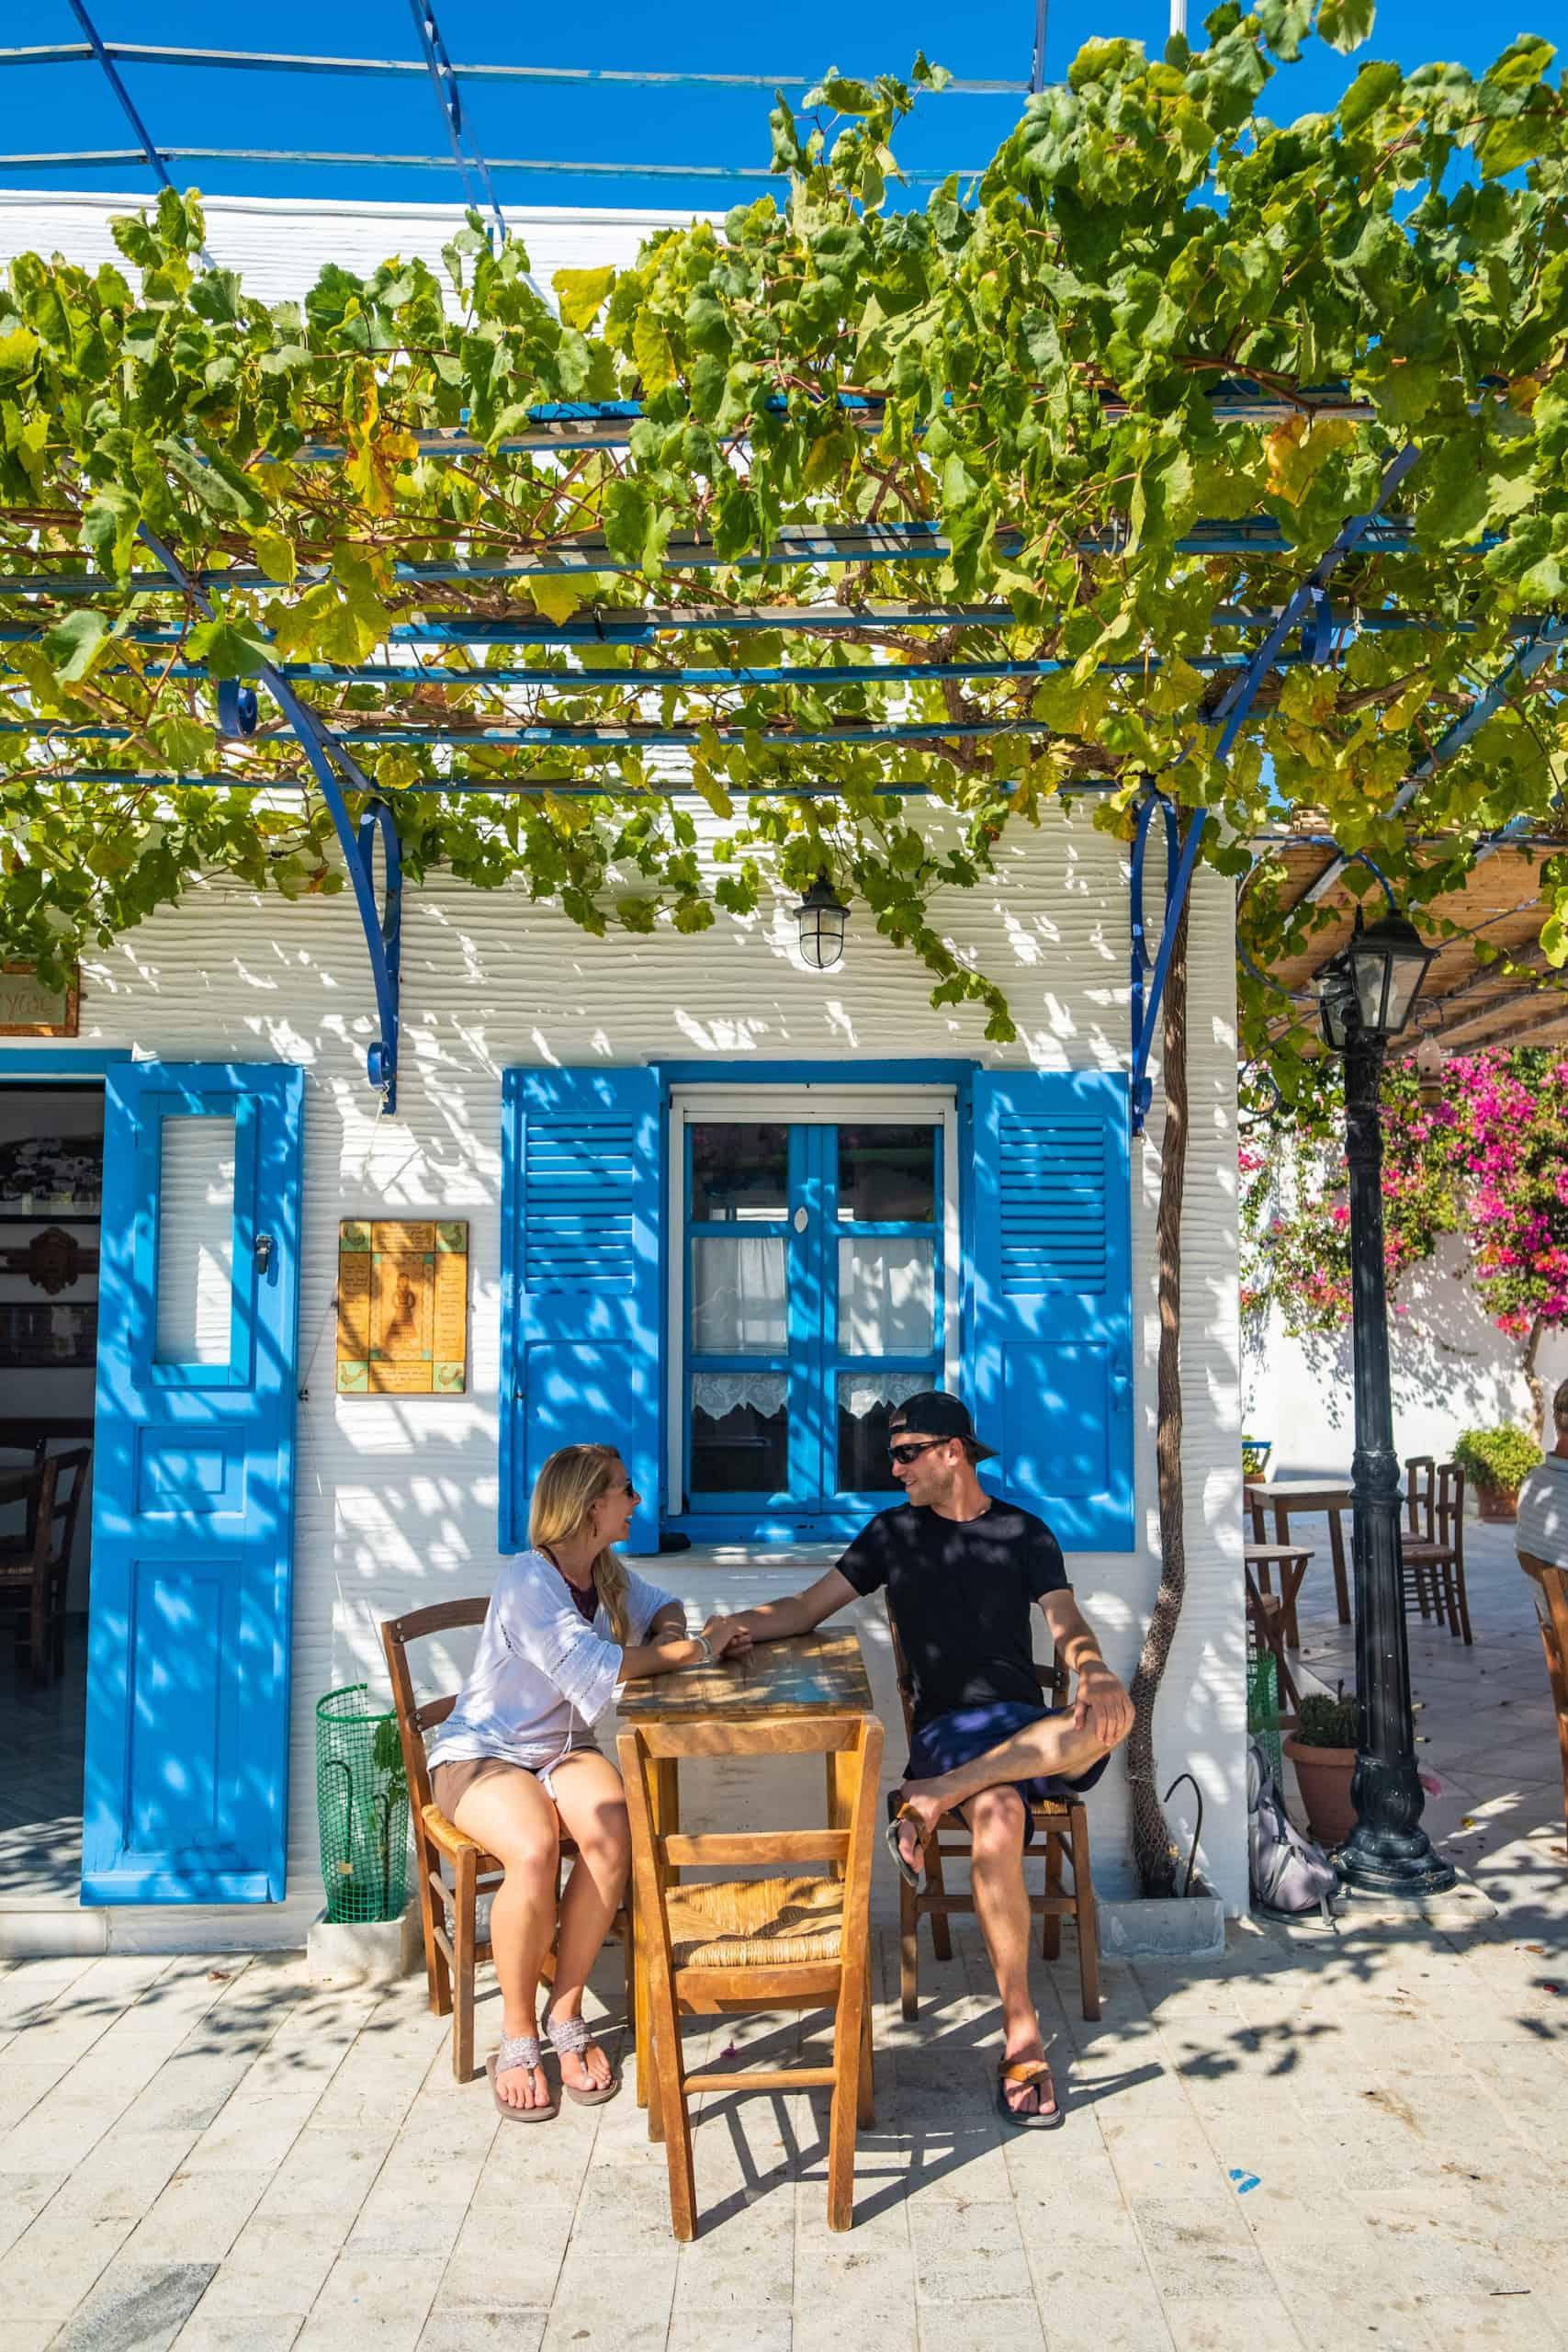 Frappes in Greece